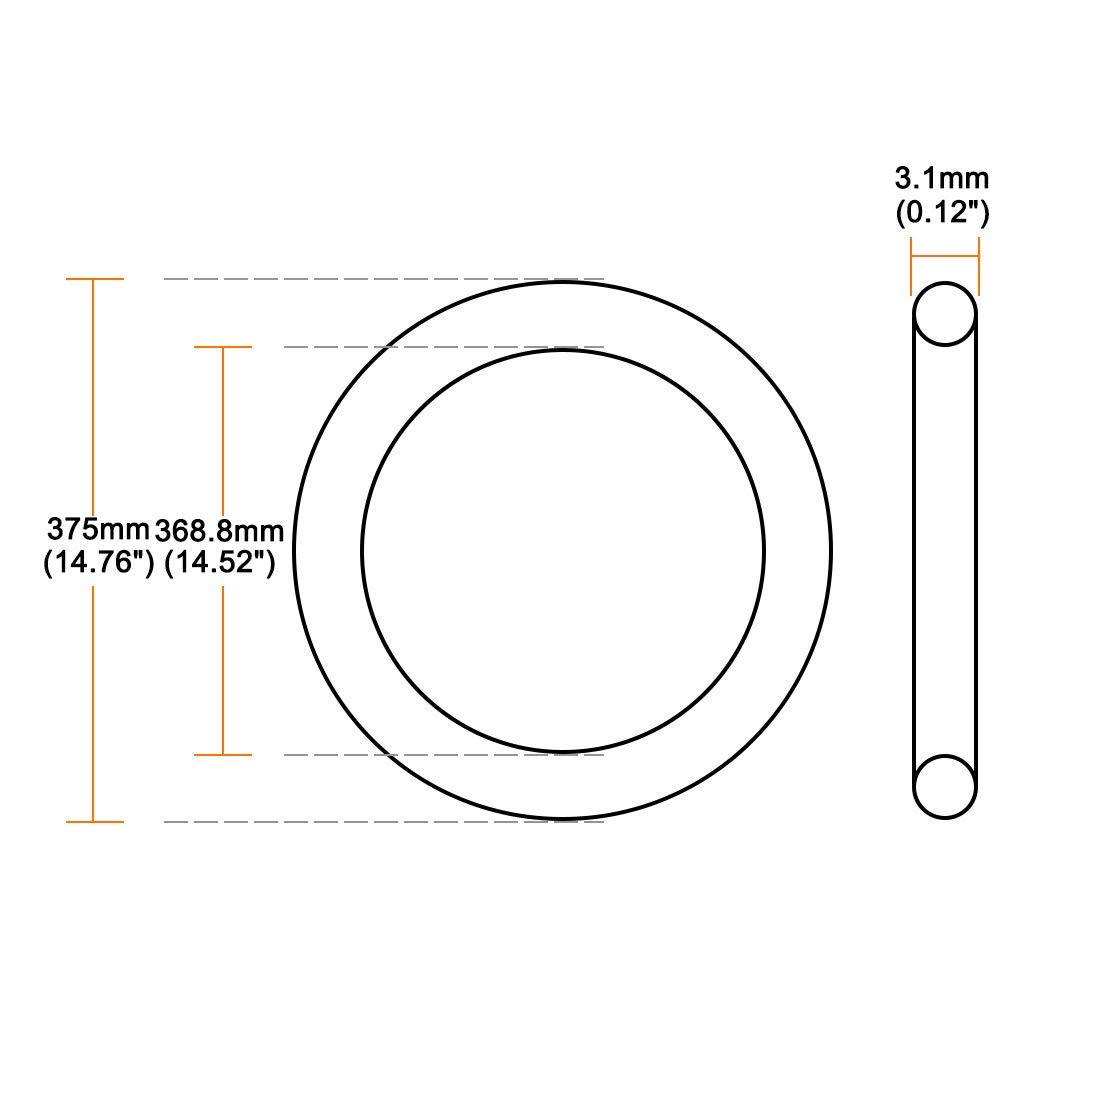 O-Rings Nitrile Rubber 393.8 mm Internal Diameter 400 mm OD 3.1 mm Width Round Seal Gasket